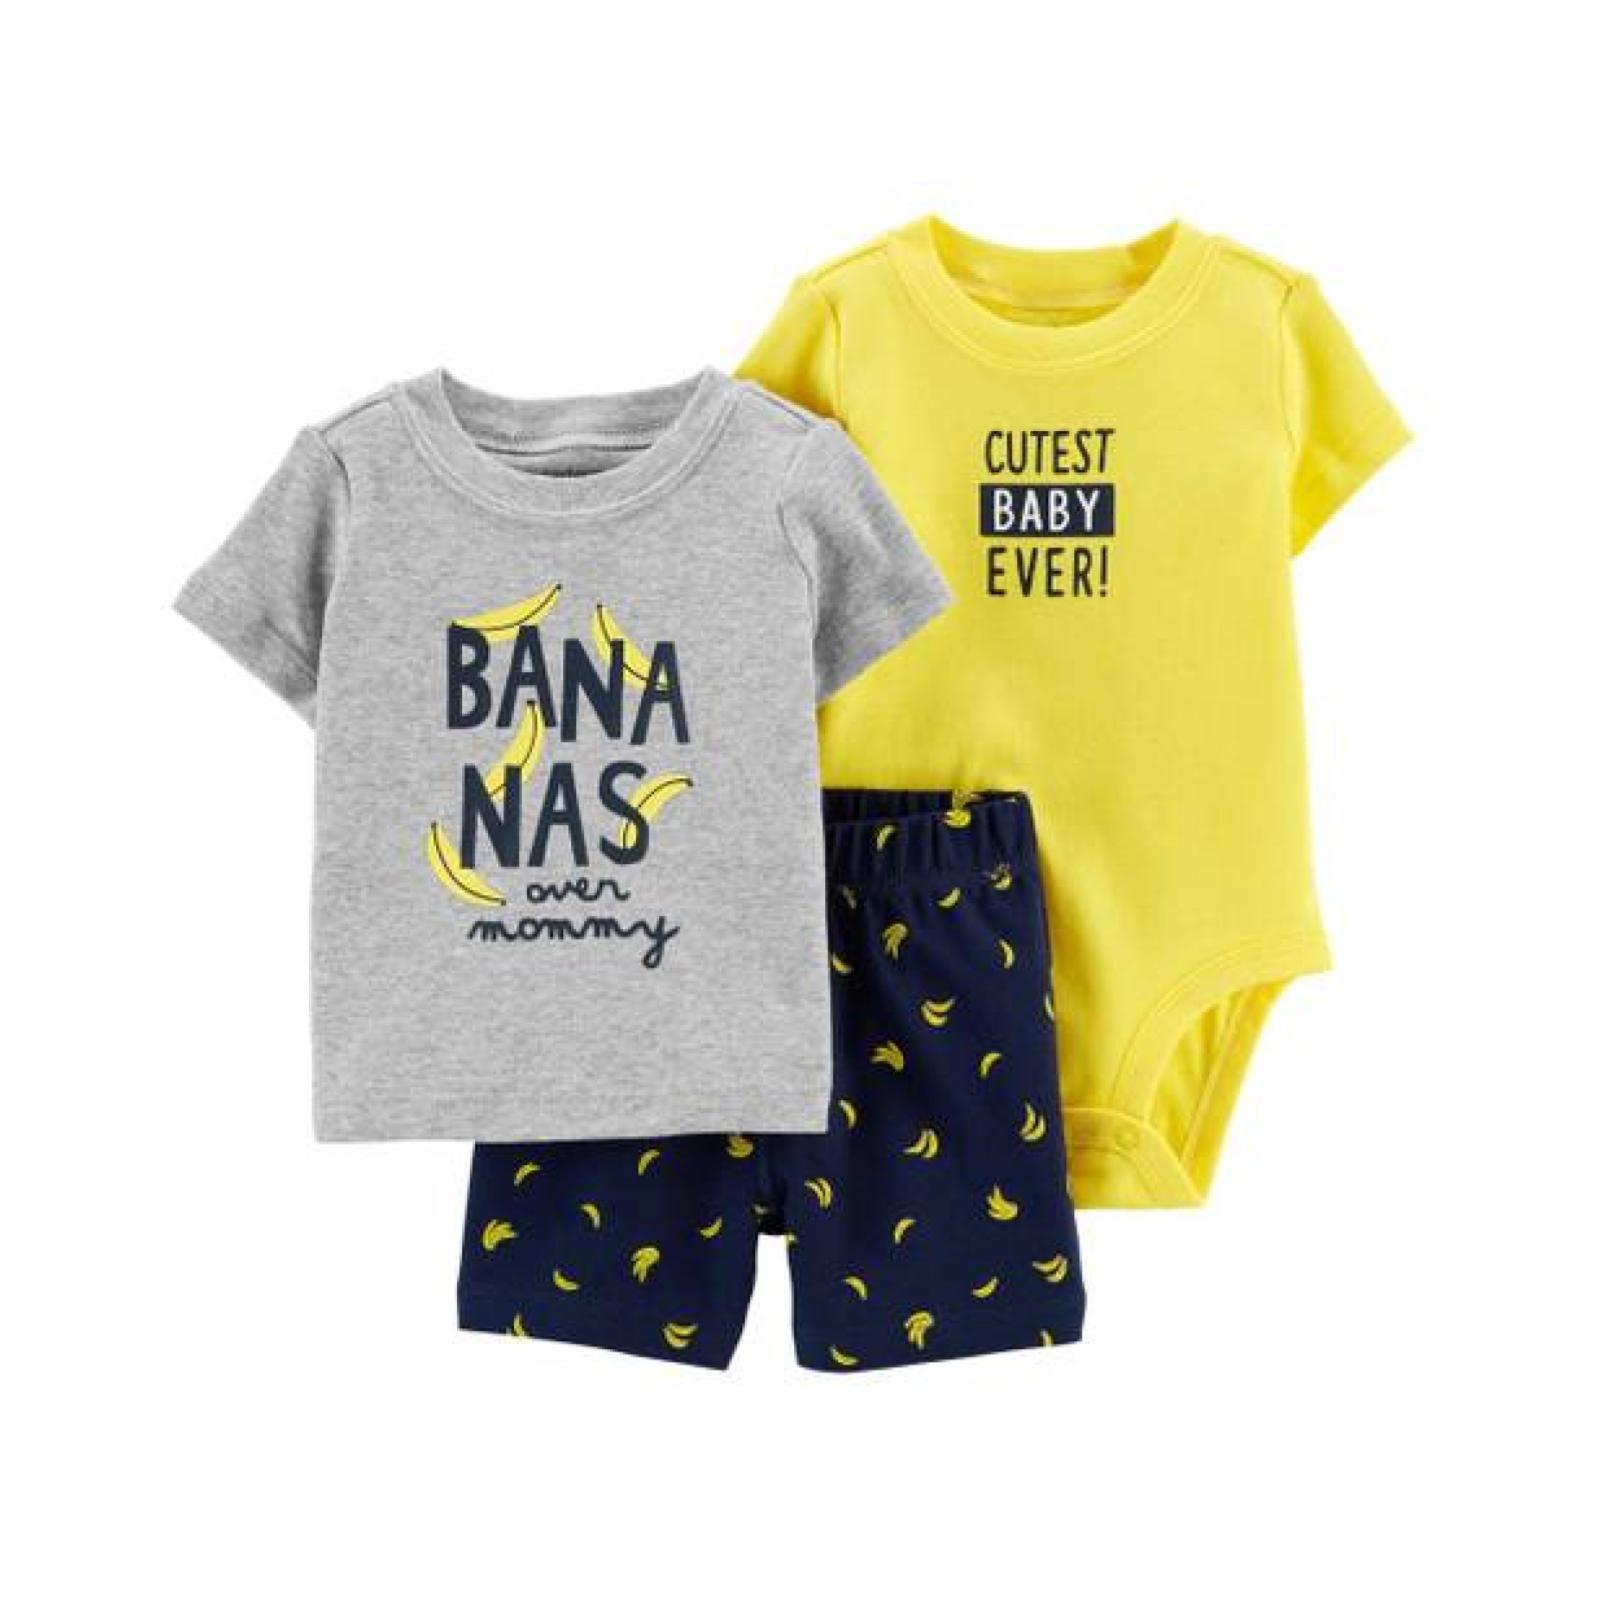 Conjunto 3 pecas bananas - shorts, body manga curta e camiseta